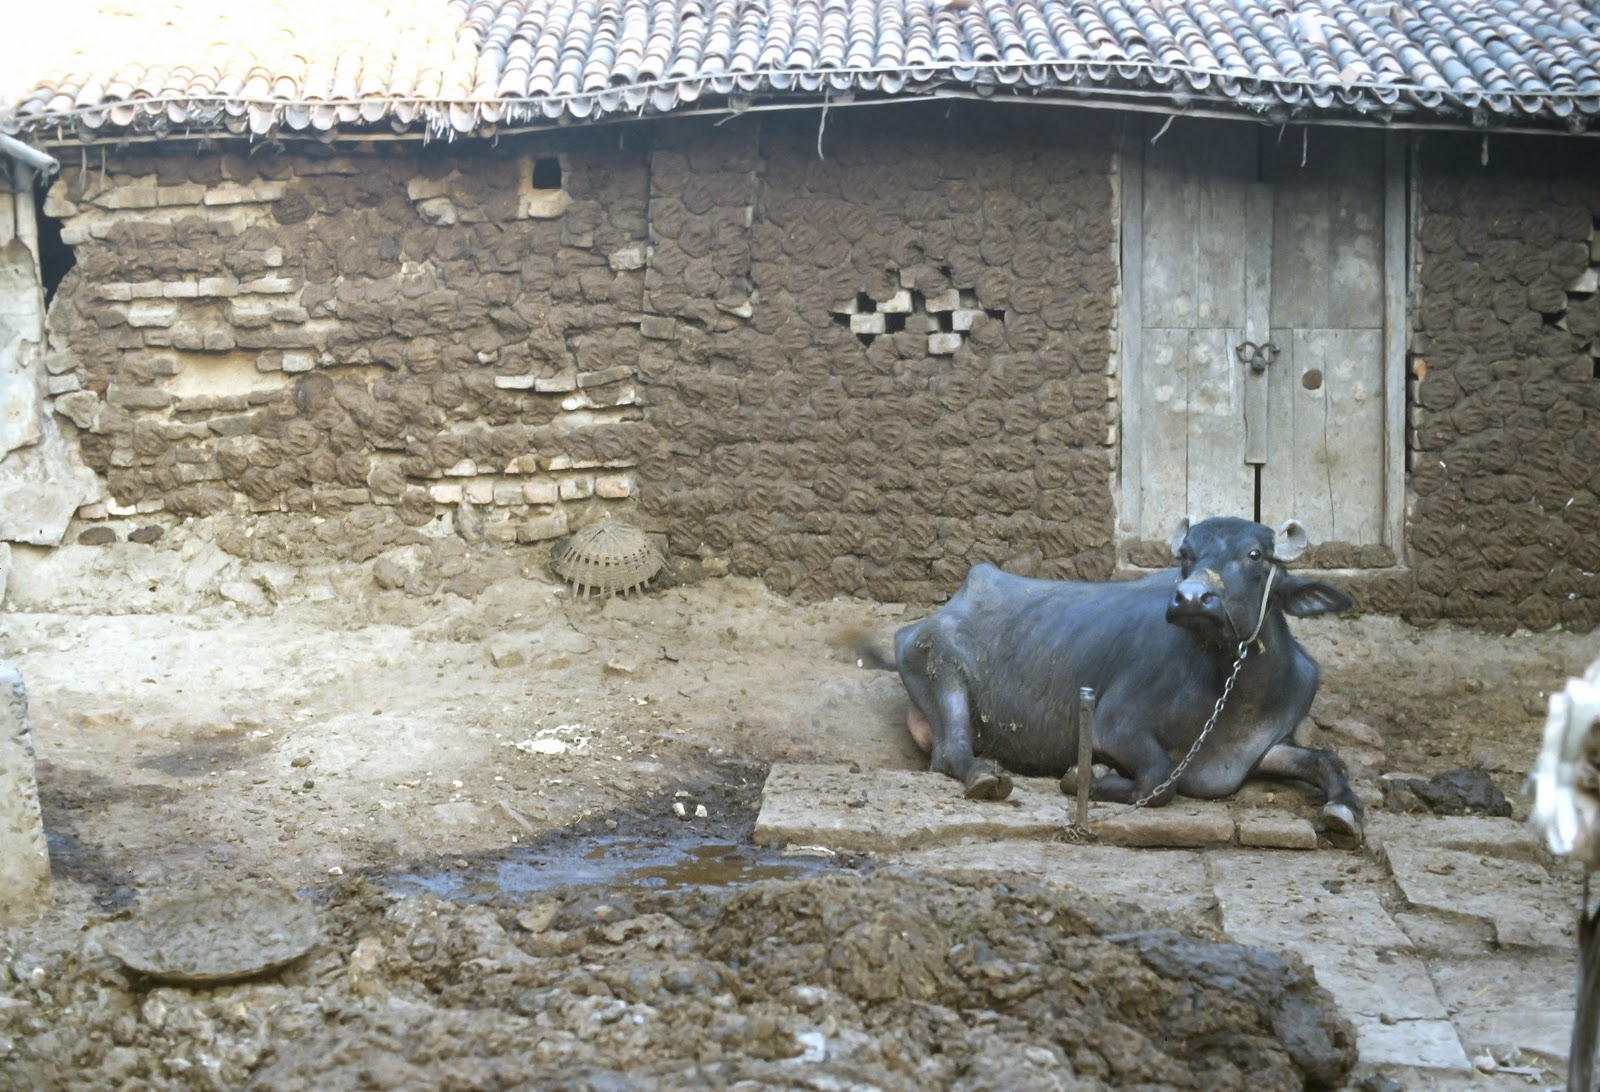 MY WABI LIFE: COW DUNG